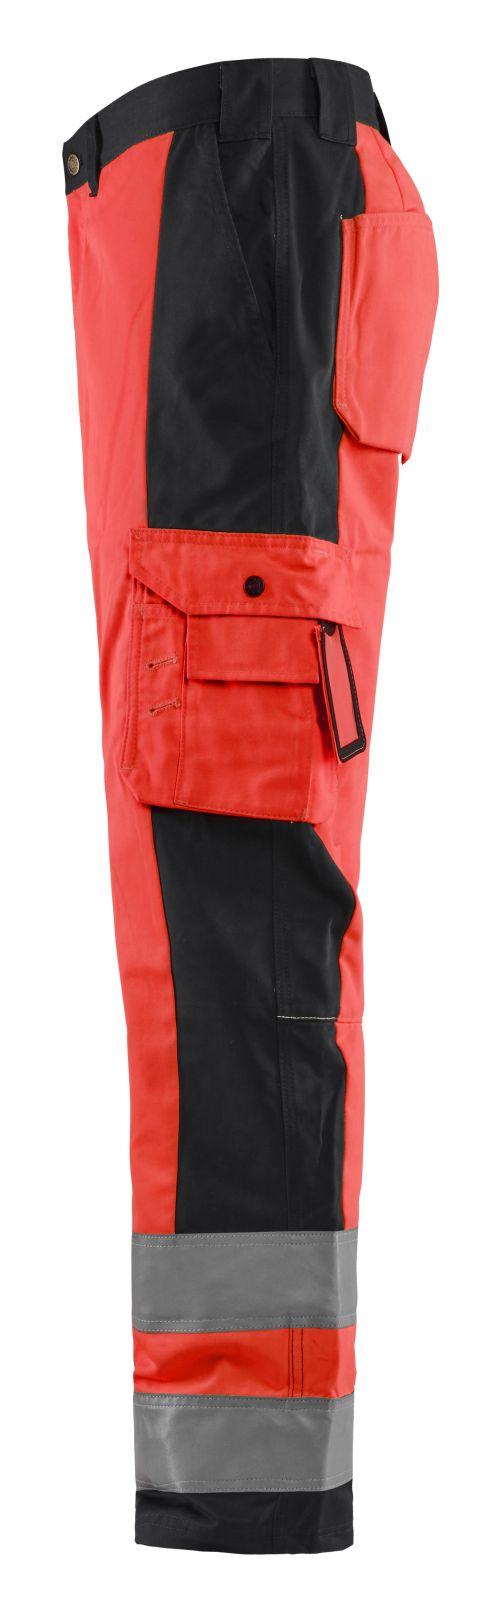 Blaklader Werkbroeken 15831860 High Vis fluo rood-zwart(5599)